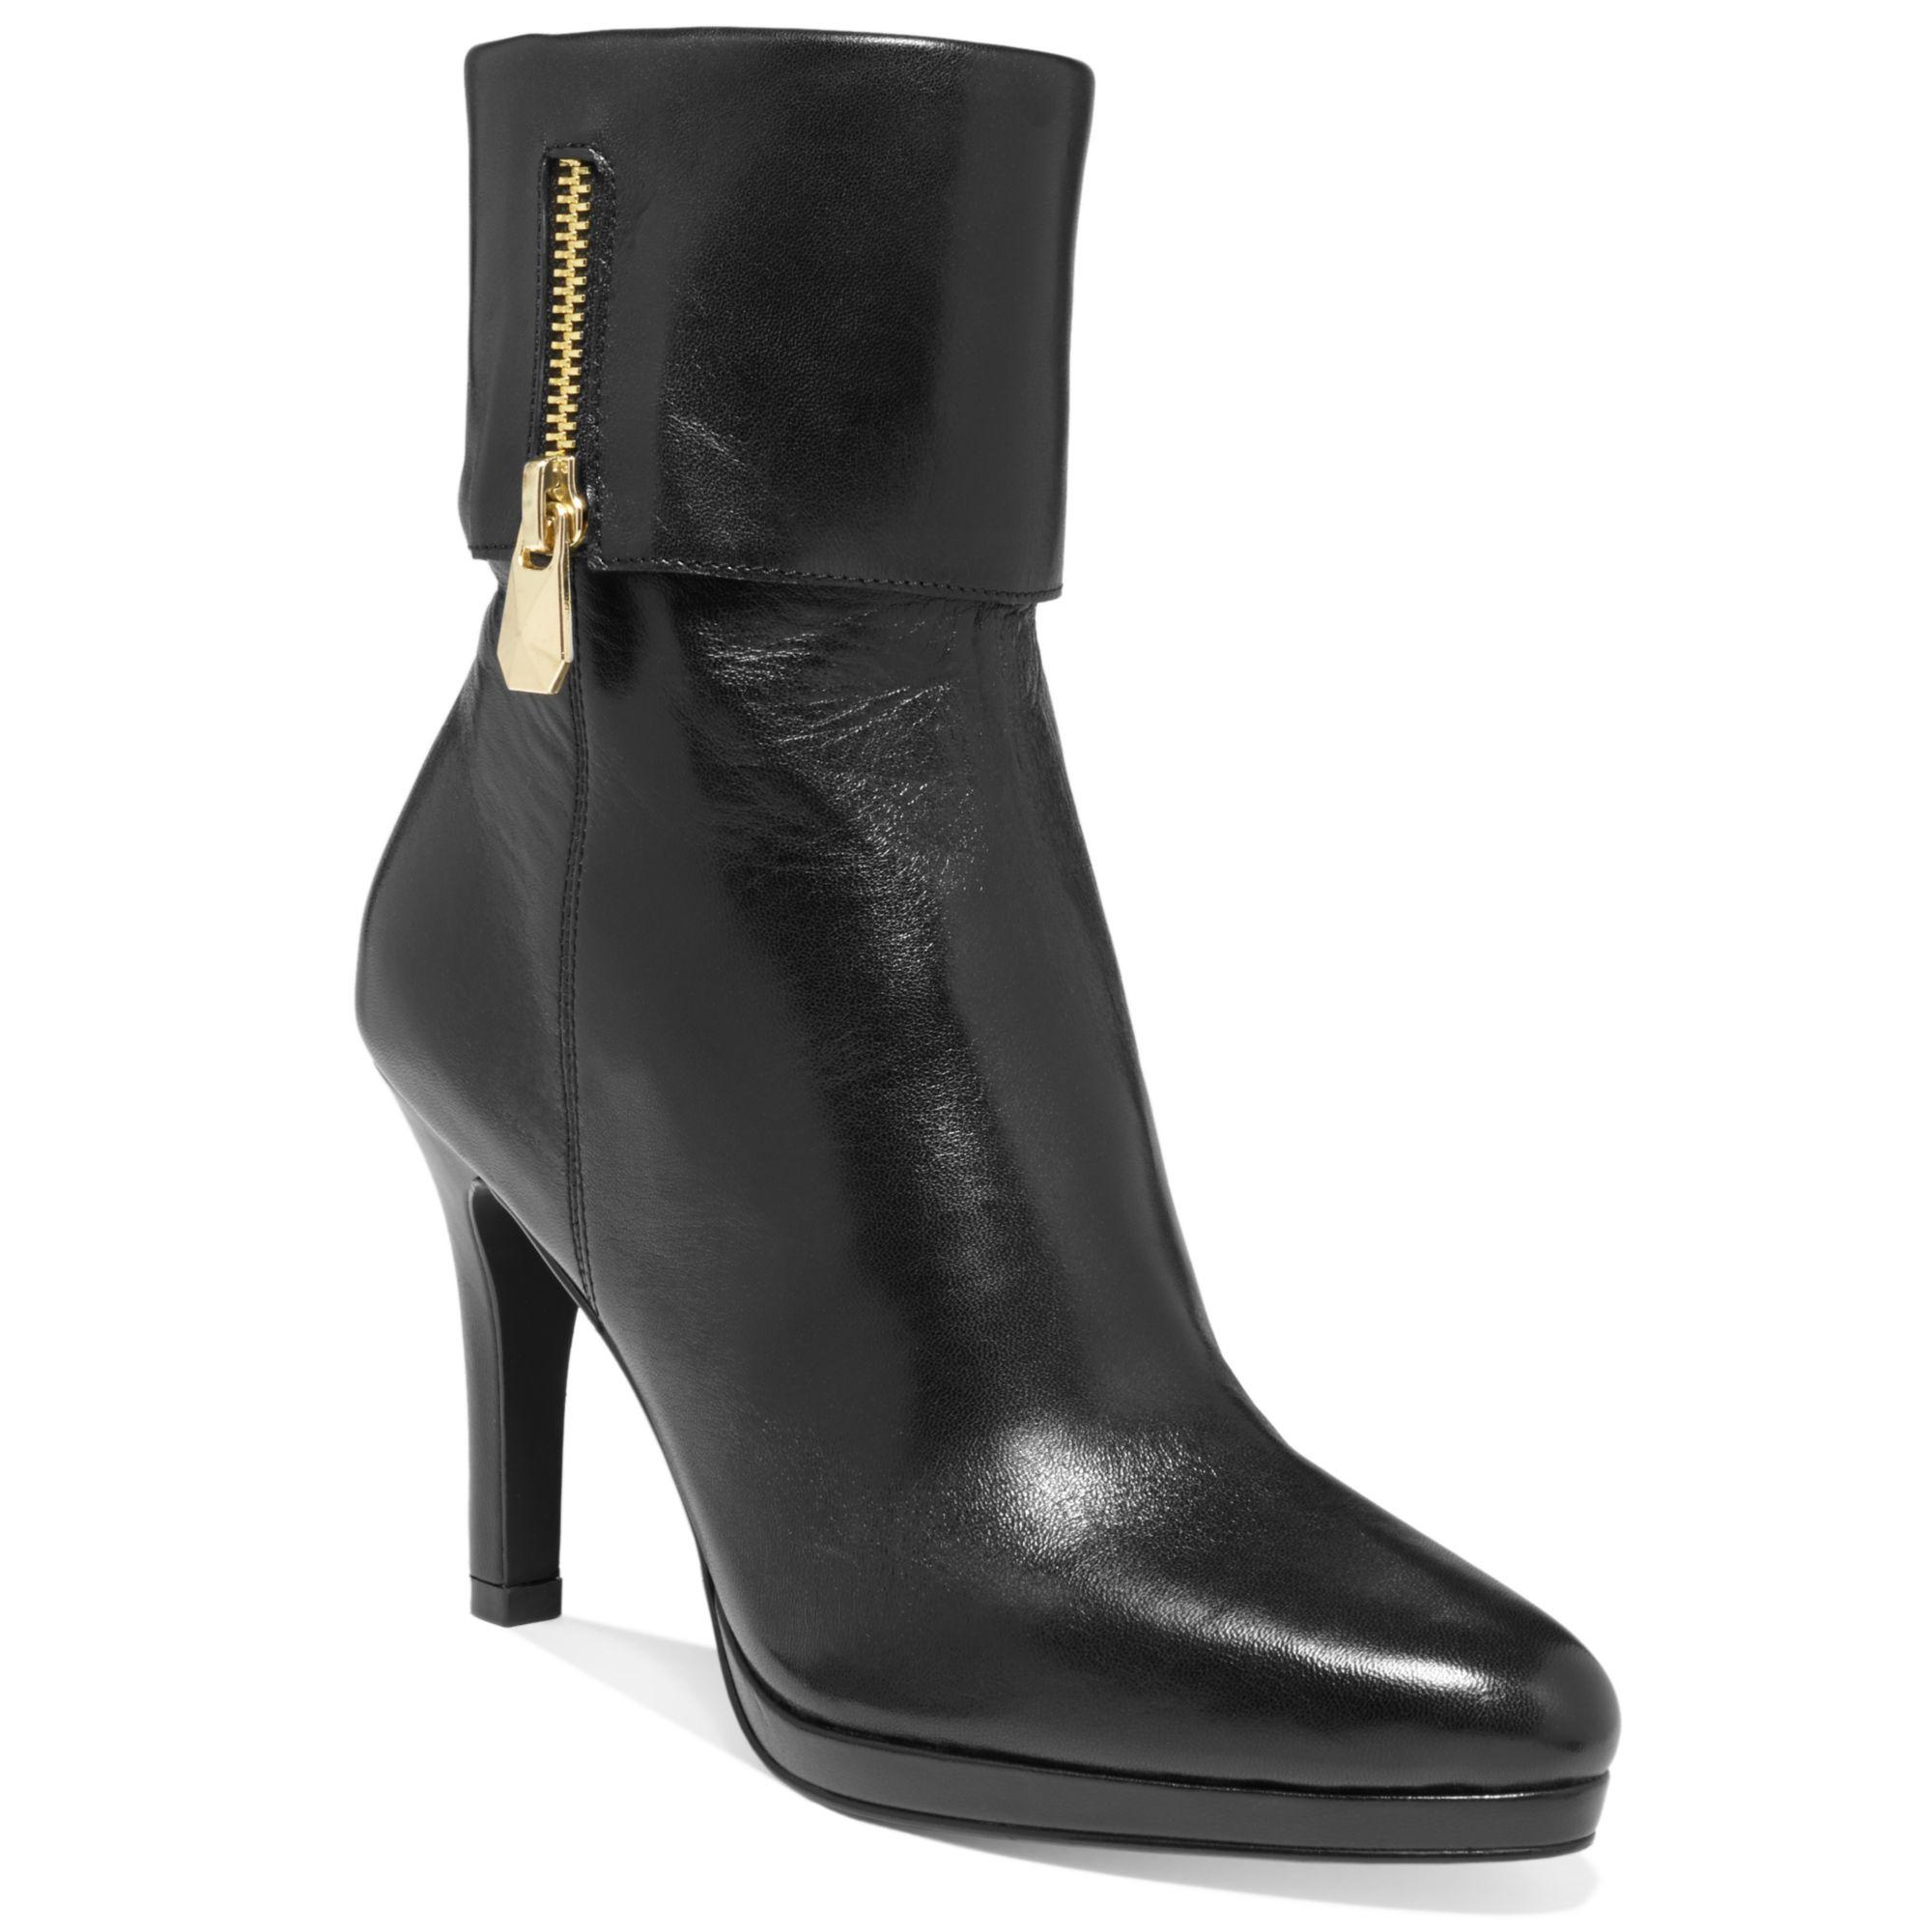 tahari gabe dress booties in black black leather lyst